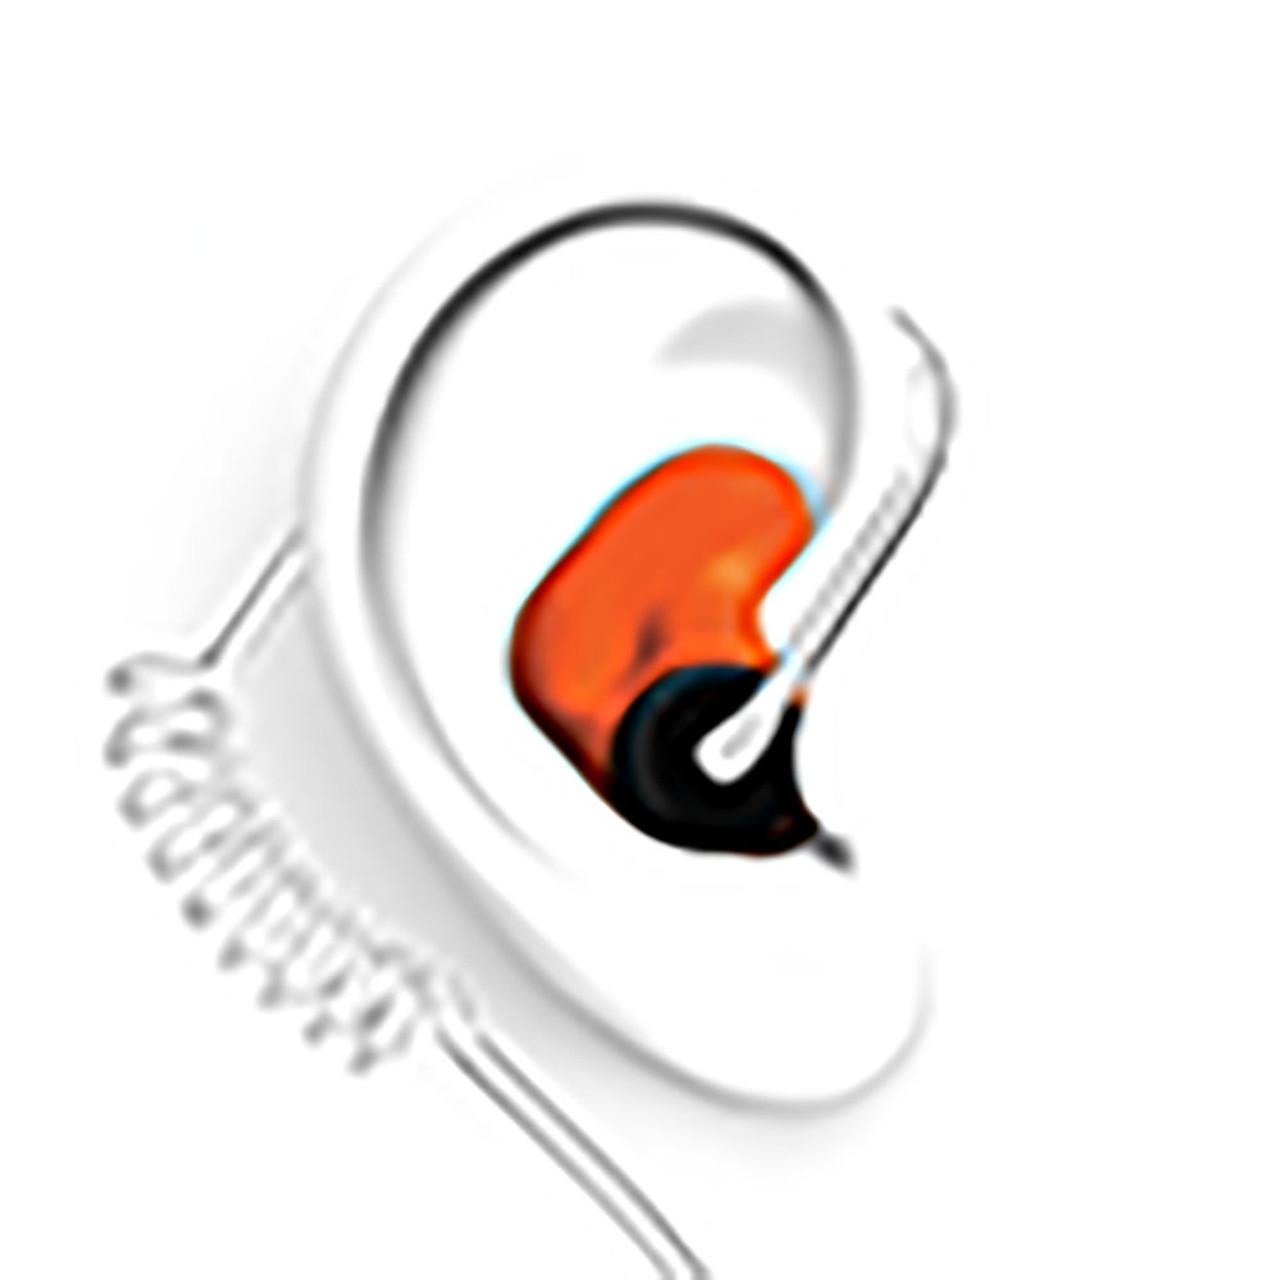 DECIBULLZ Orange Custom Earplug for Two Way Radio Headsets